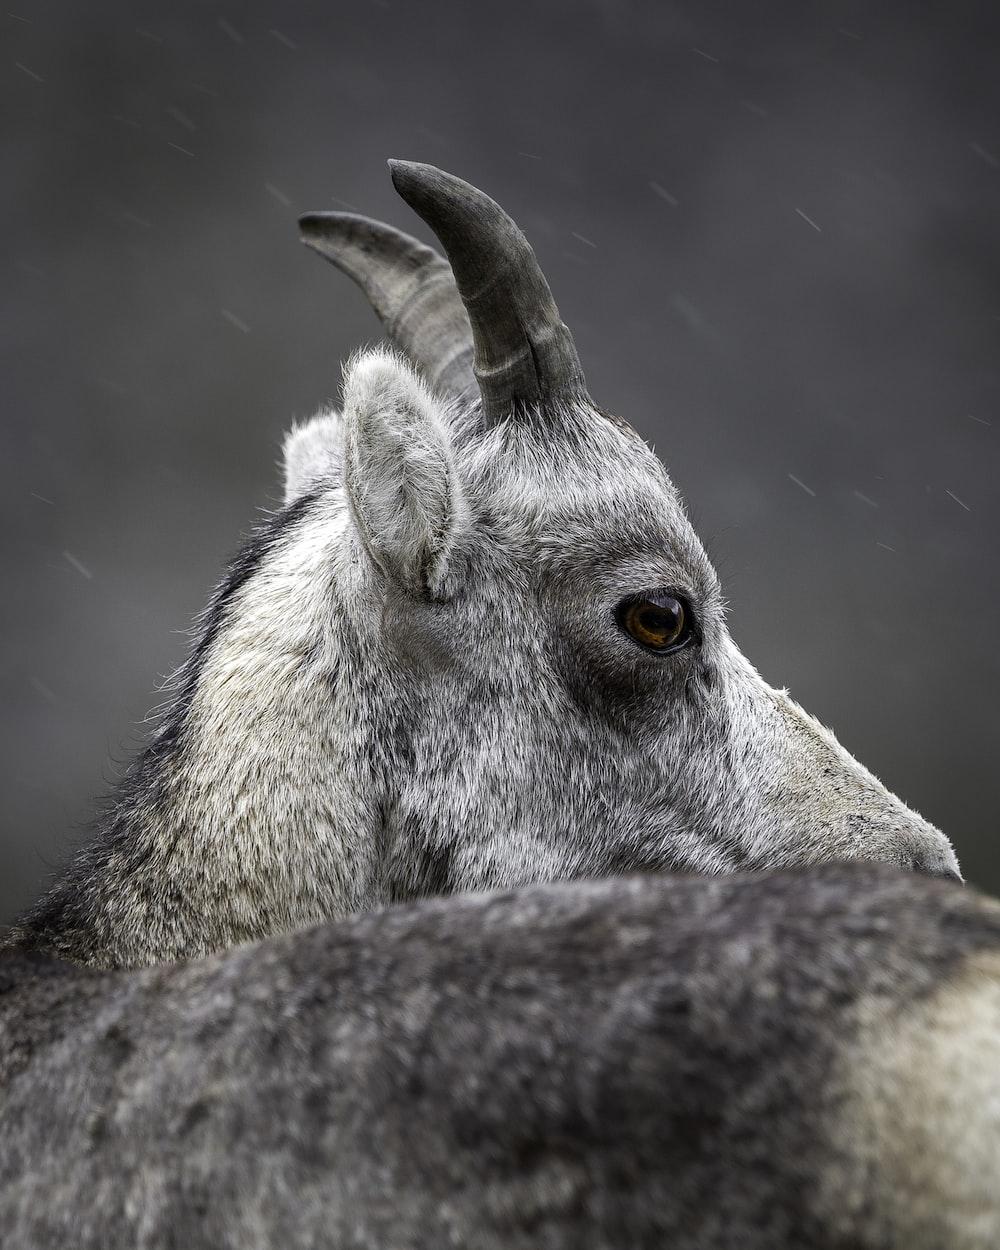 gray and white animal head